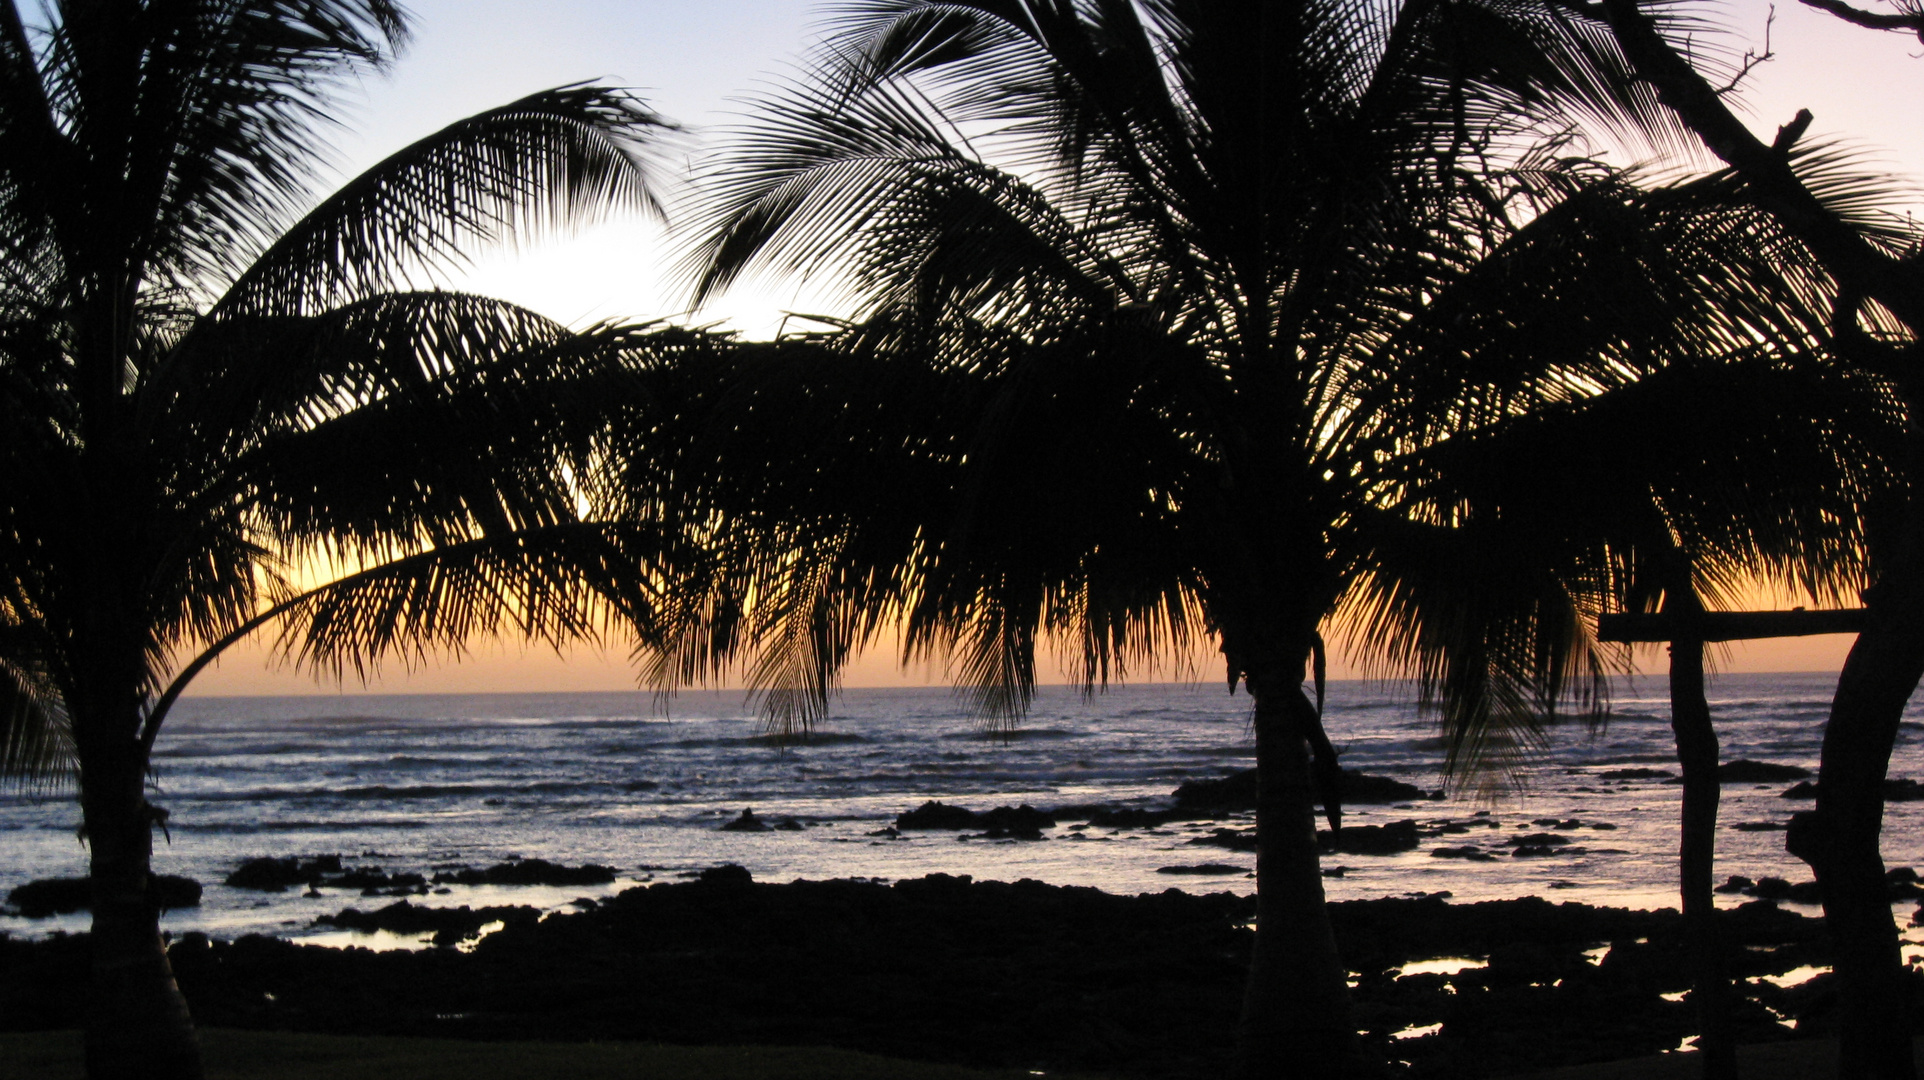 Nach dem Sonnenuntergang am Strand in Costa Rica